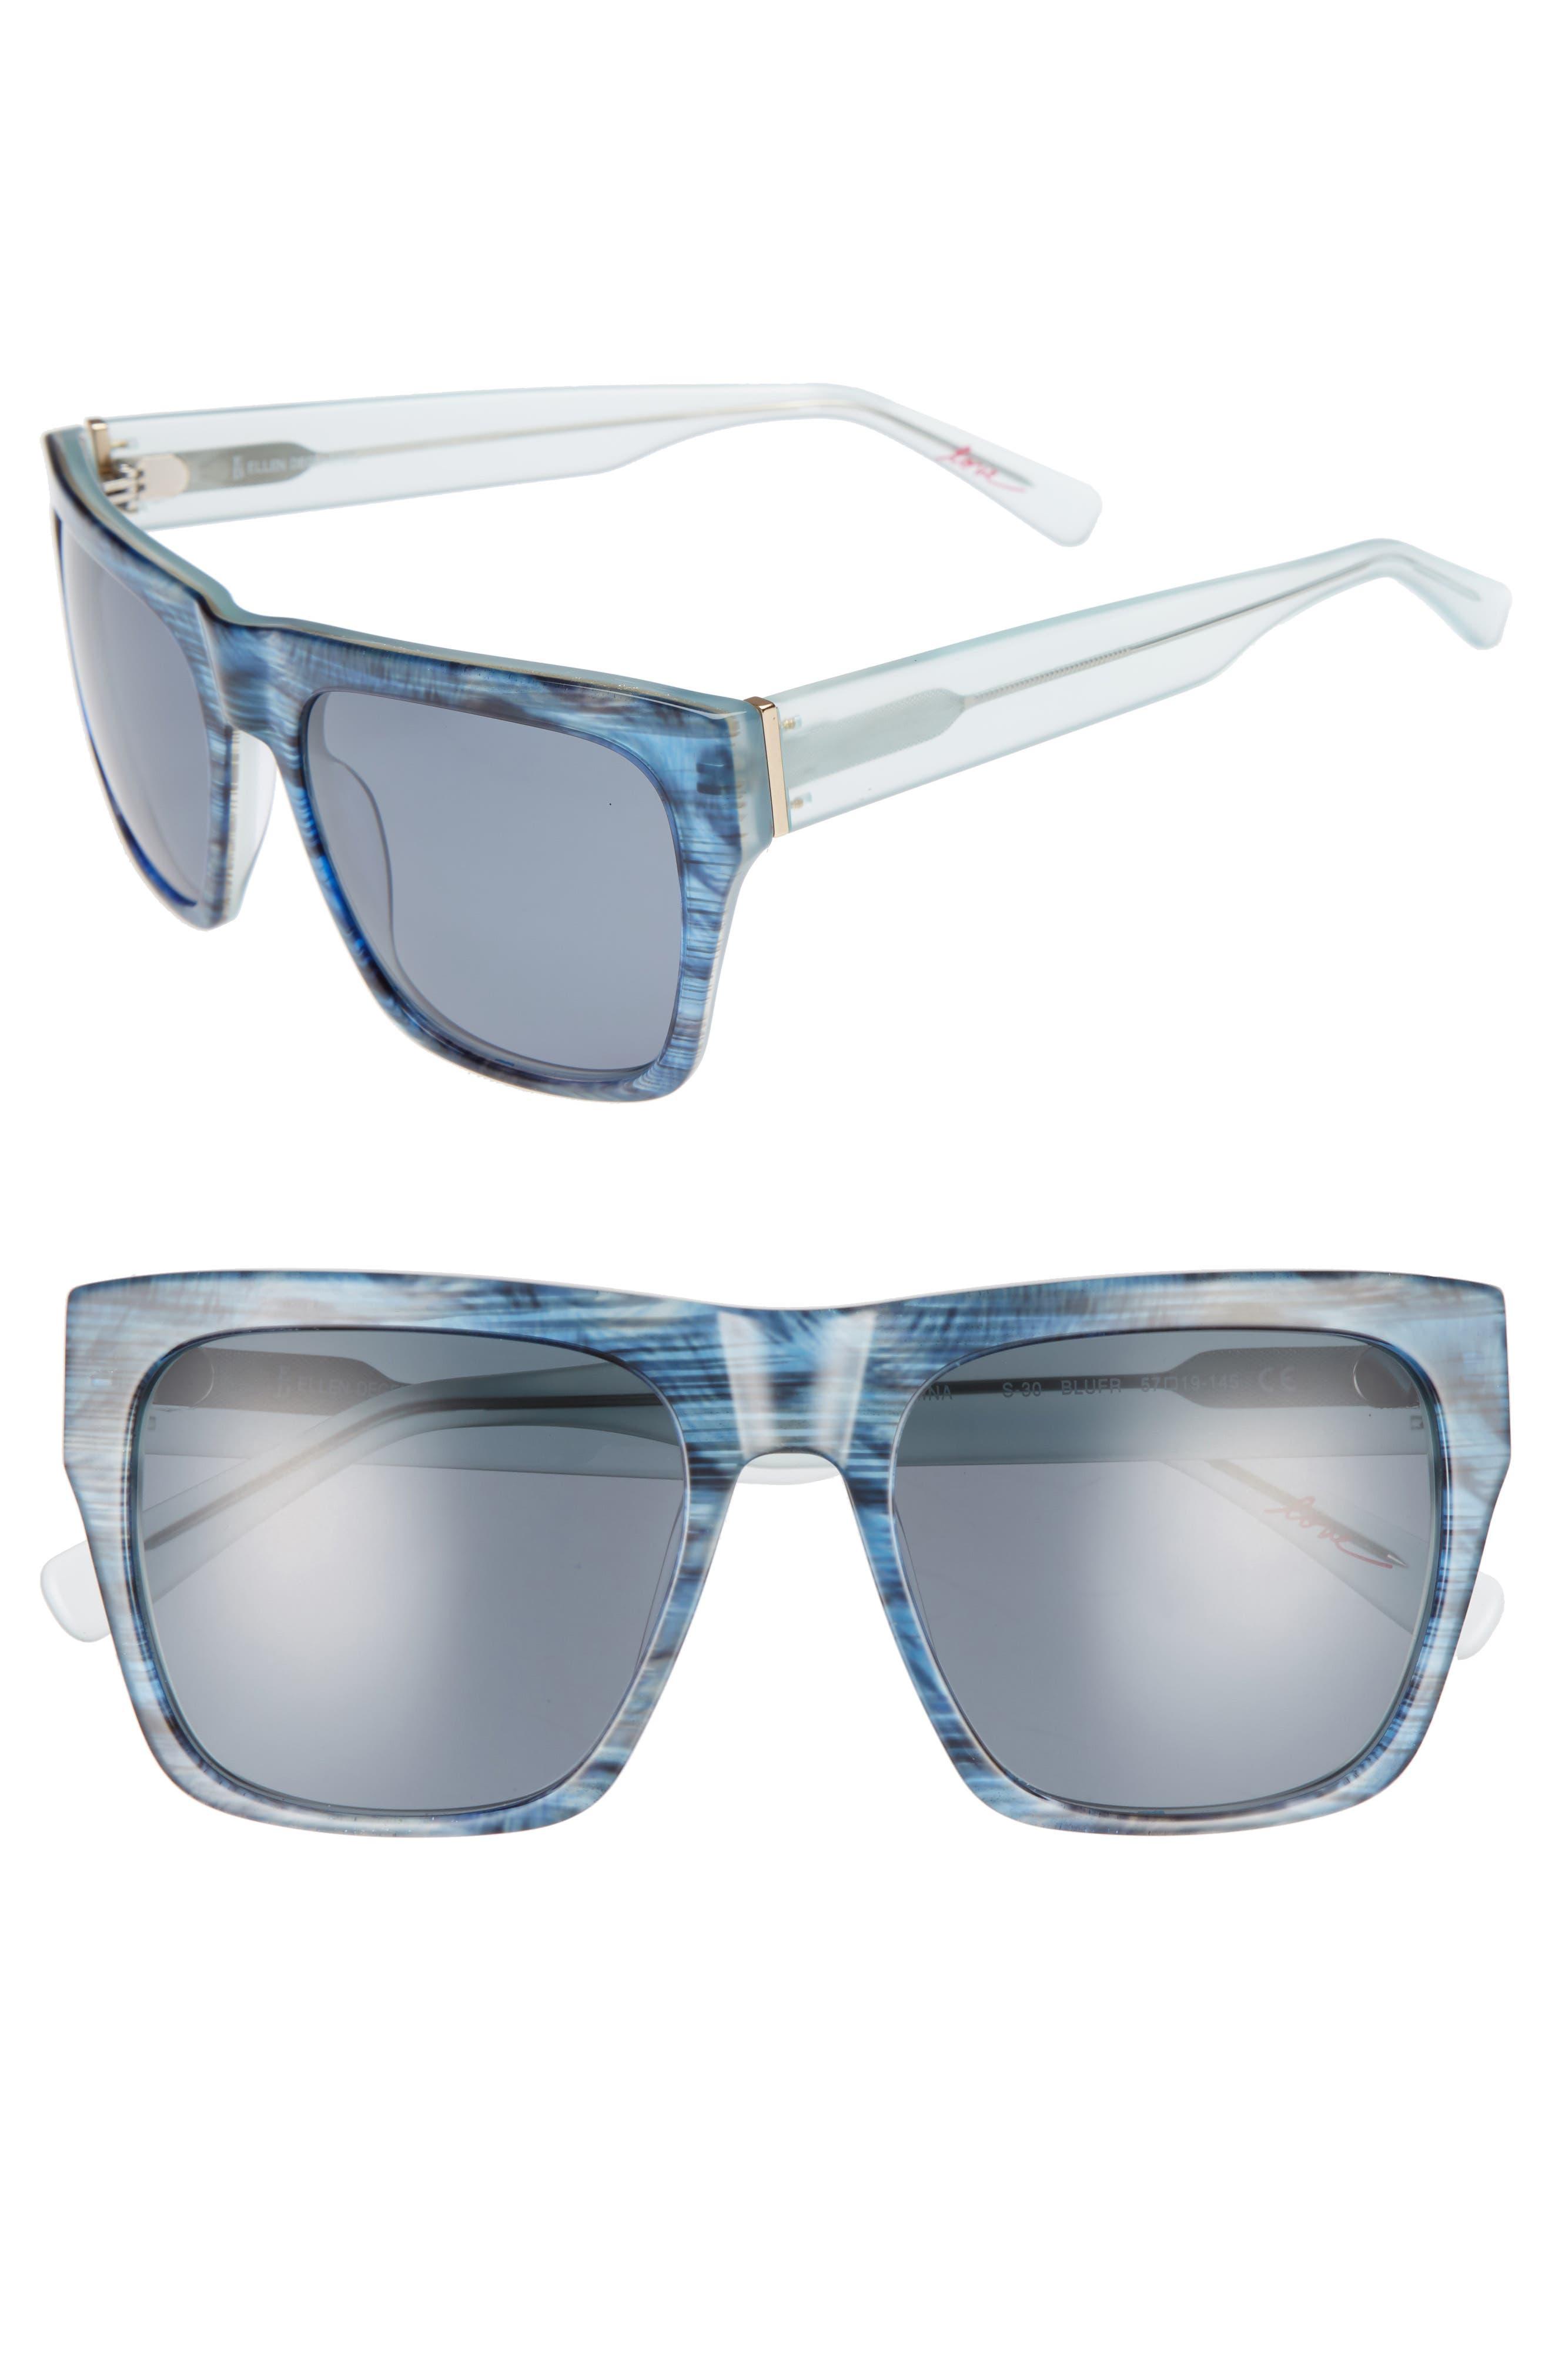 57mm Gradient Square Sunglasses,                         Main,                         color, BLUE FEATHER